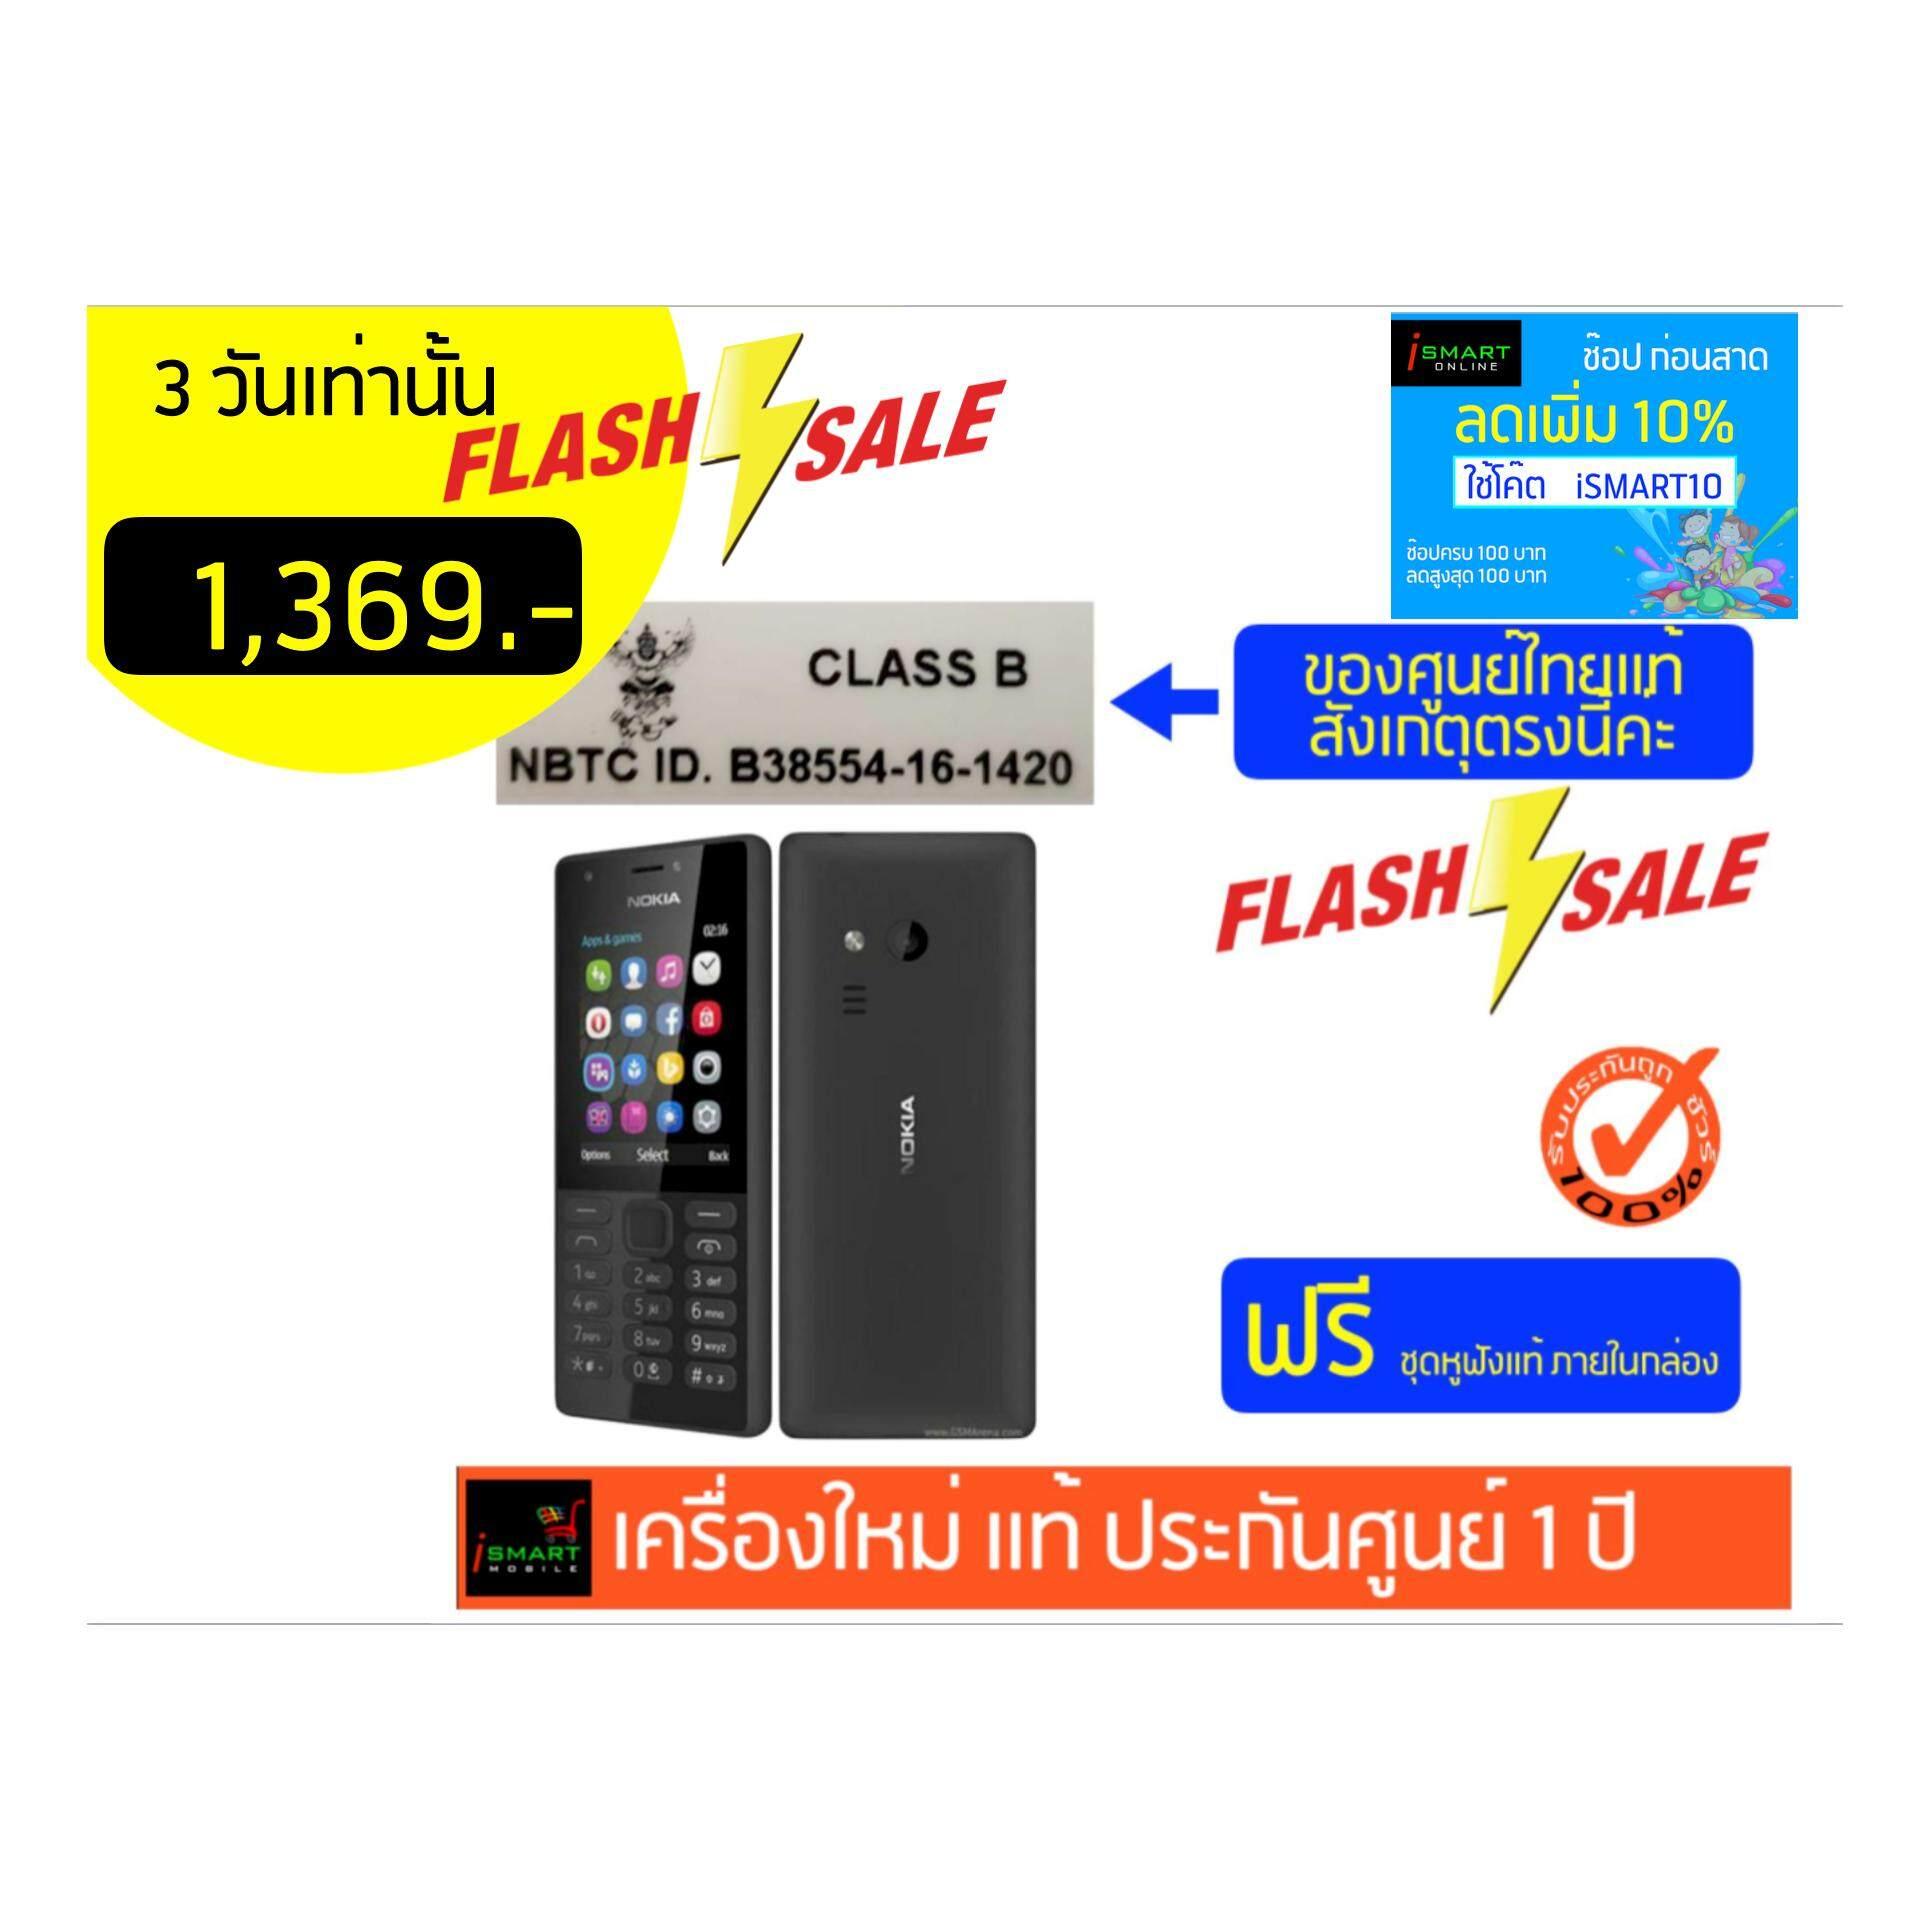 Nokia 216 สีดำ เหลือเพียง 1,369 บาทเมื่อกดโค๊ต ismart10 ฟรี Smalltalk ภายในกล่องพร้อมส่งฟรี!